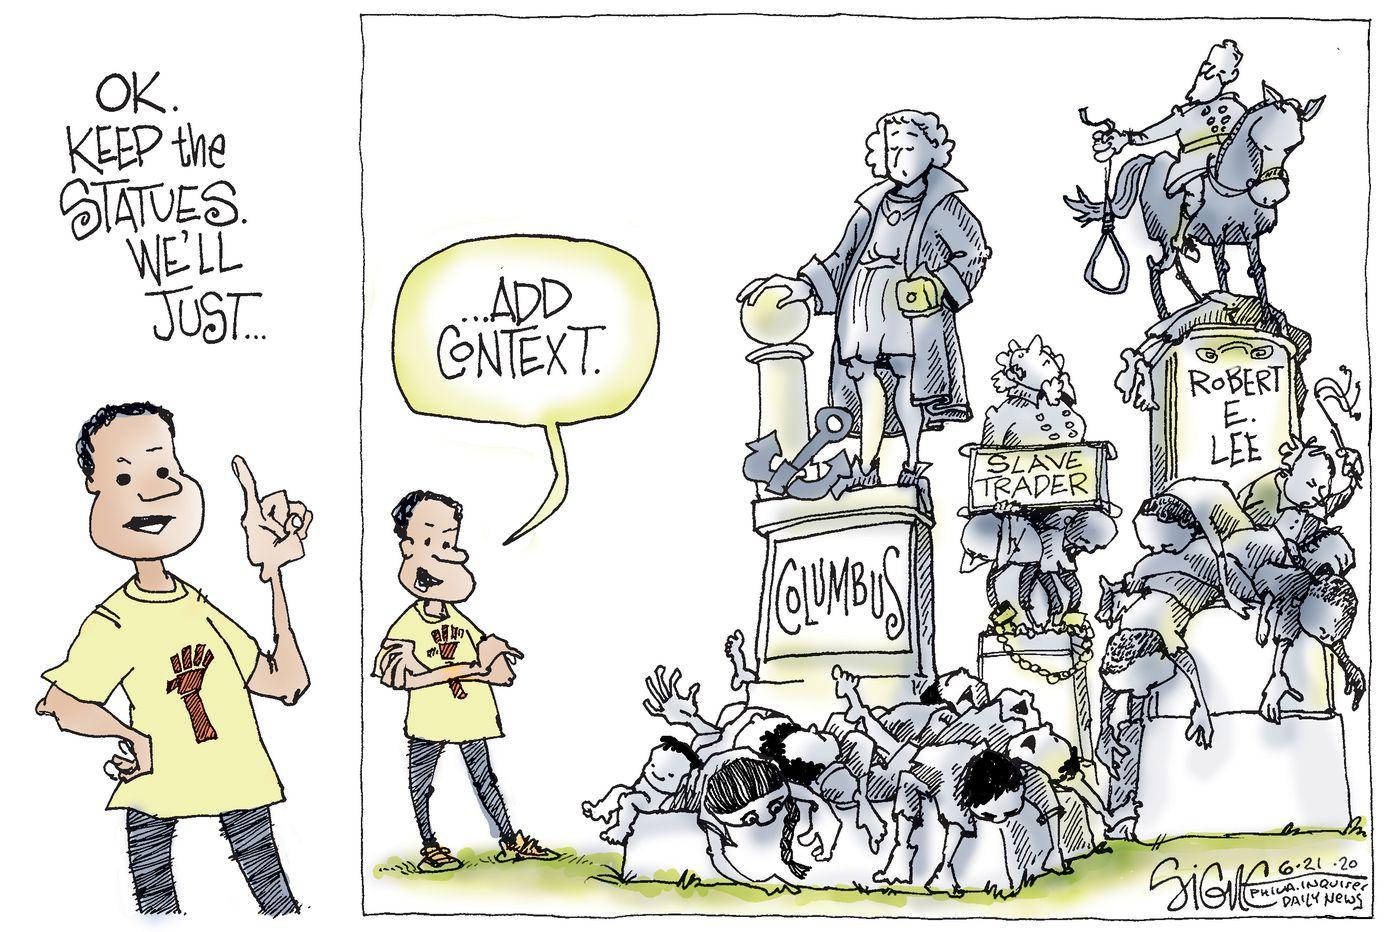 Political Cartoon: Statues in context